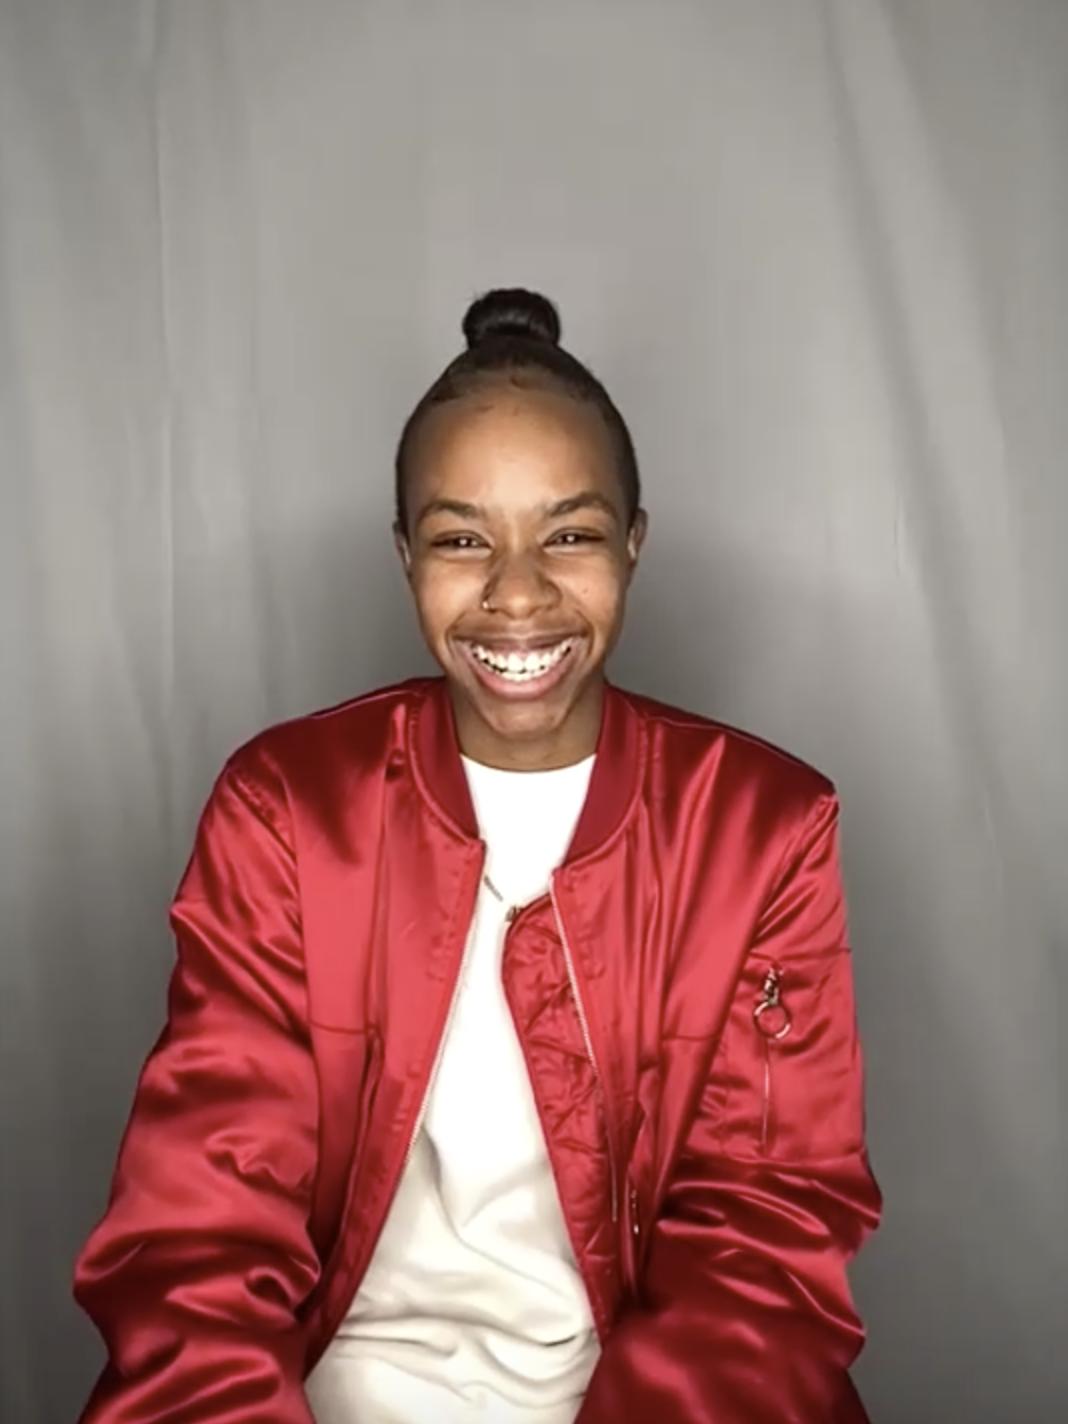 Angel smiling wearing a shiny jacket